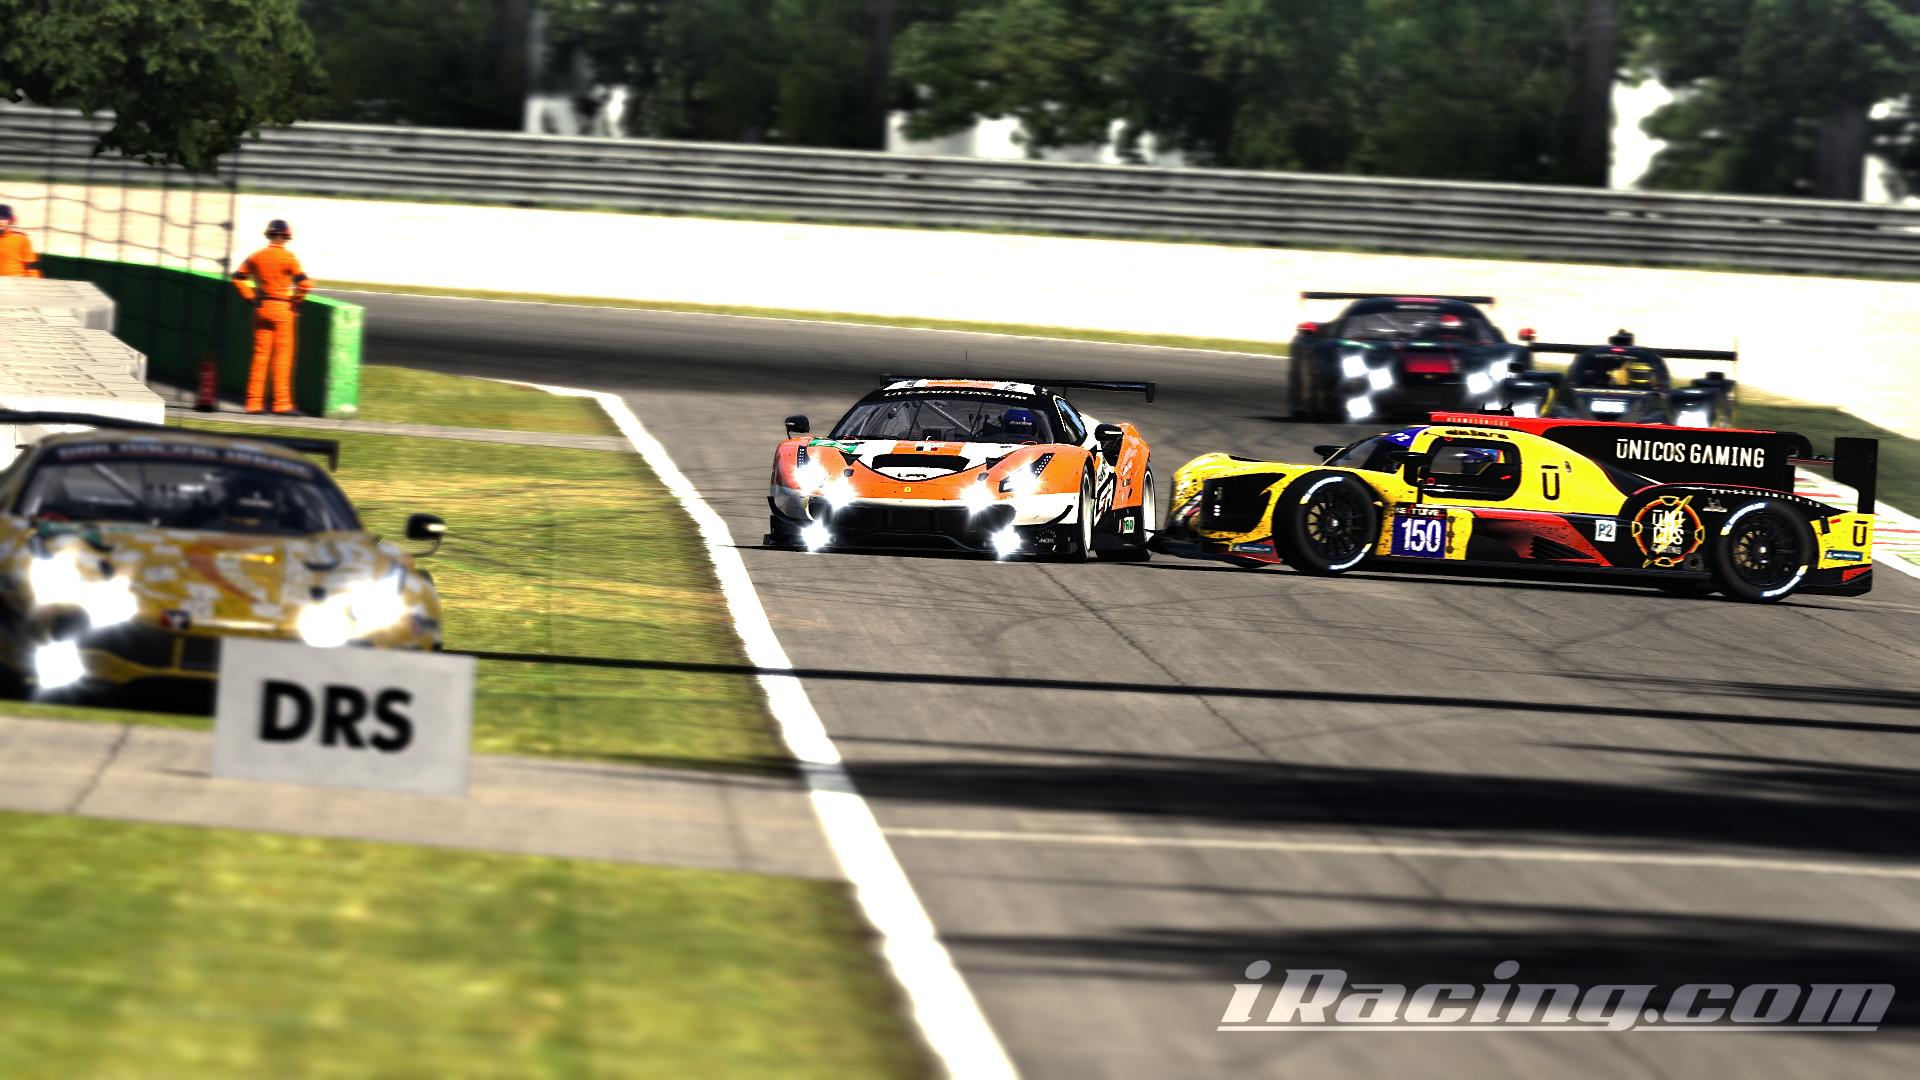 LSR Motorsport Grey - Rudy Lagneau, David Nury - EES : 06H00 Monza (iRacing S02-21)